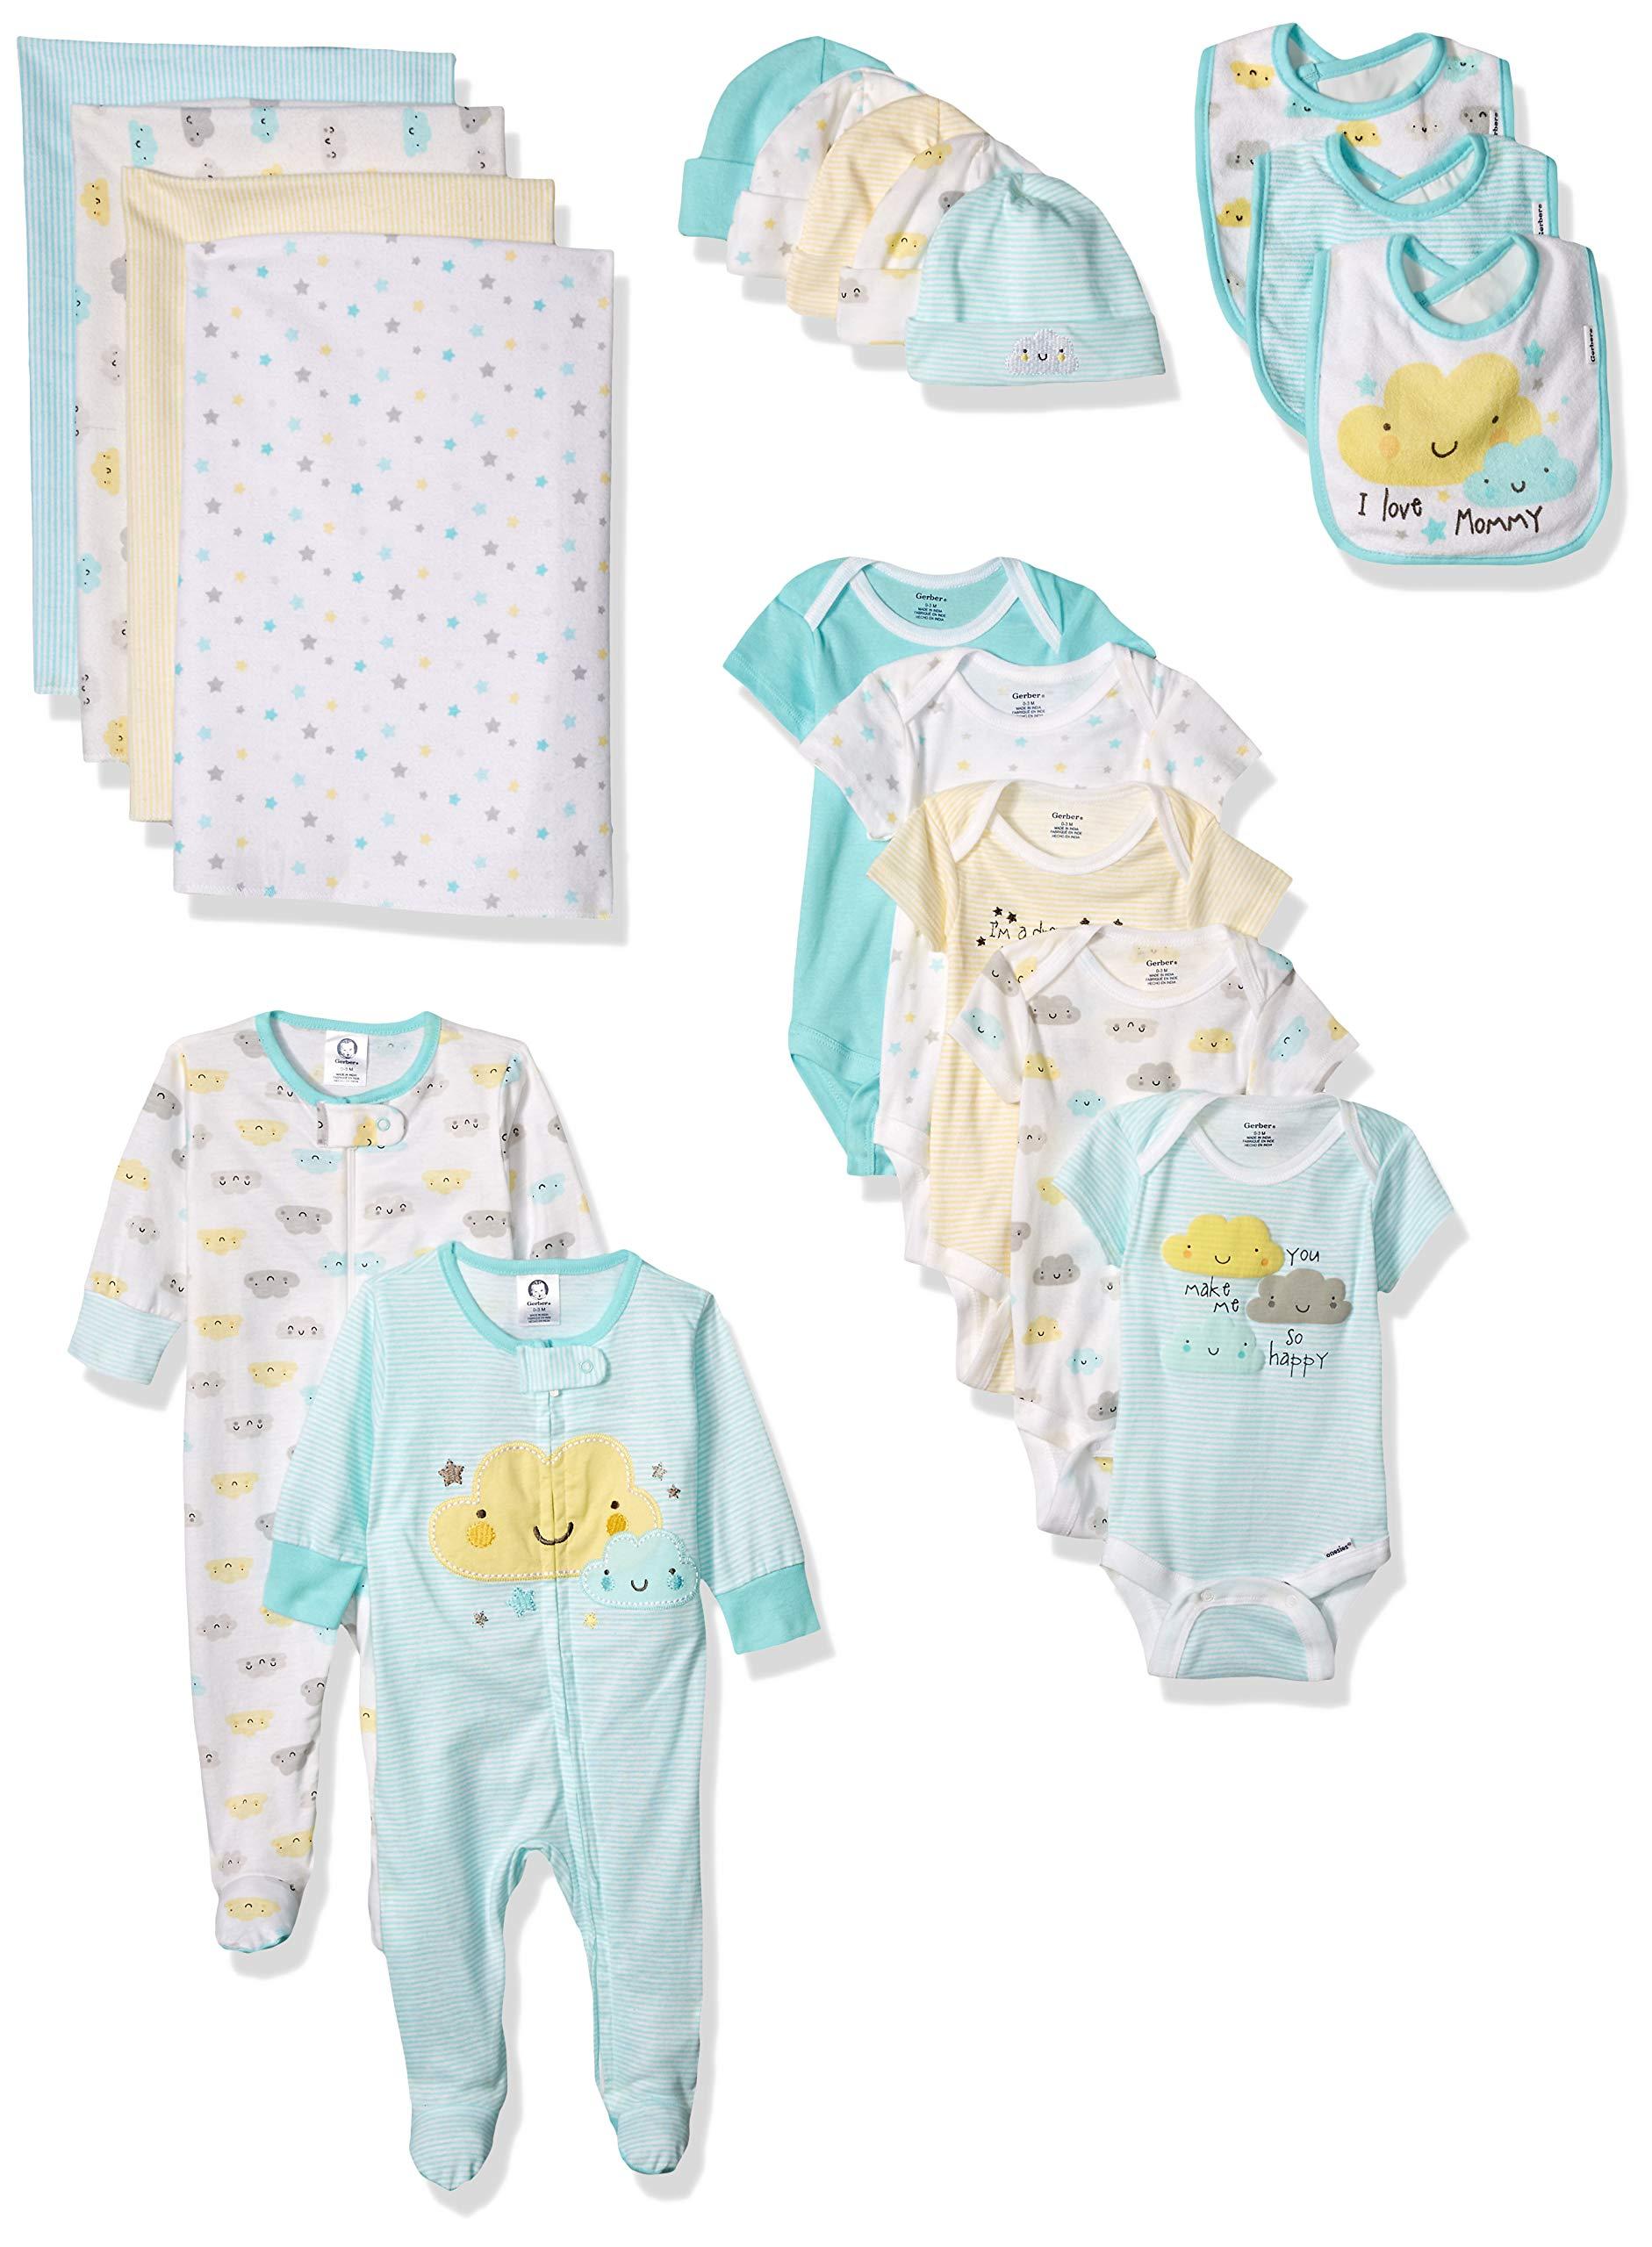 Gerber Baby 19-Piece Essentials Gift Set, Clouds, Newborn